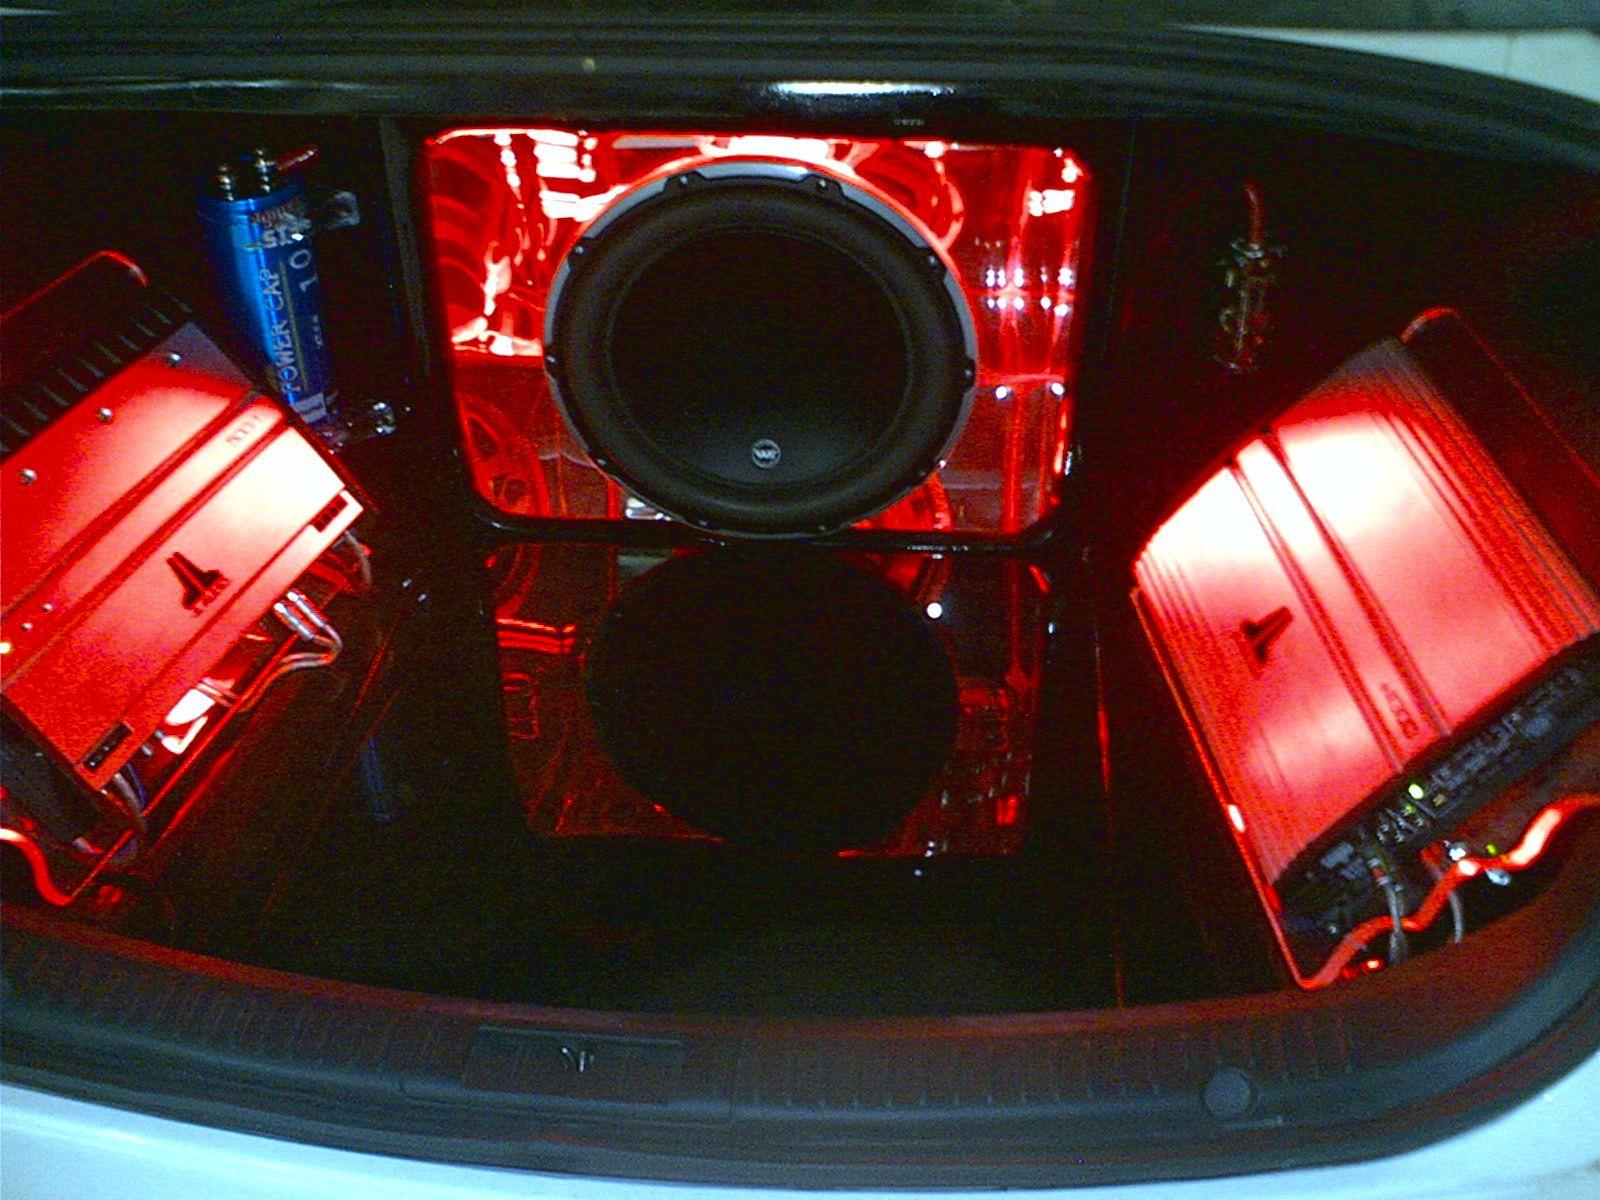 Speaker systems set up for cars mazda 3 sir charles full jl audio set up